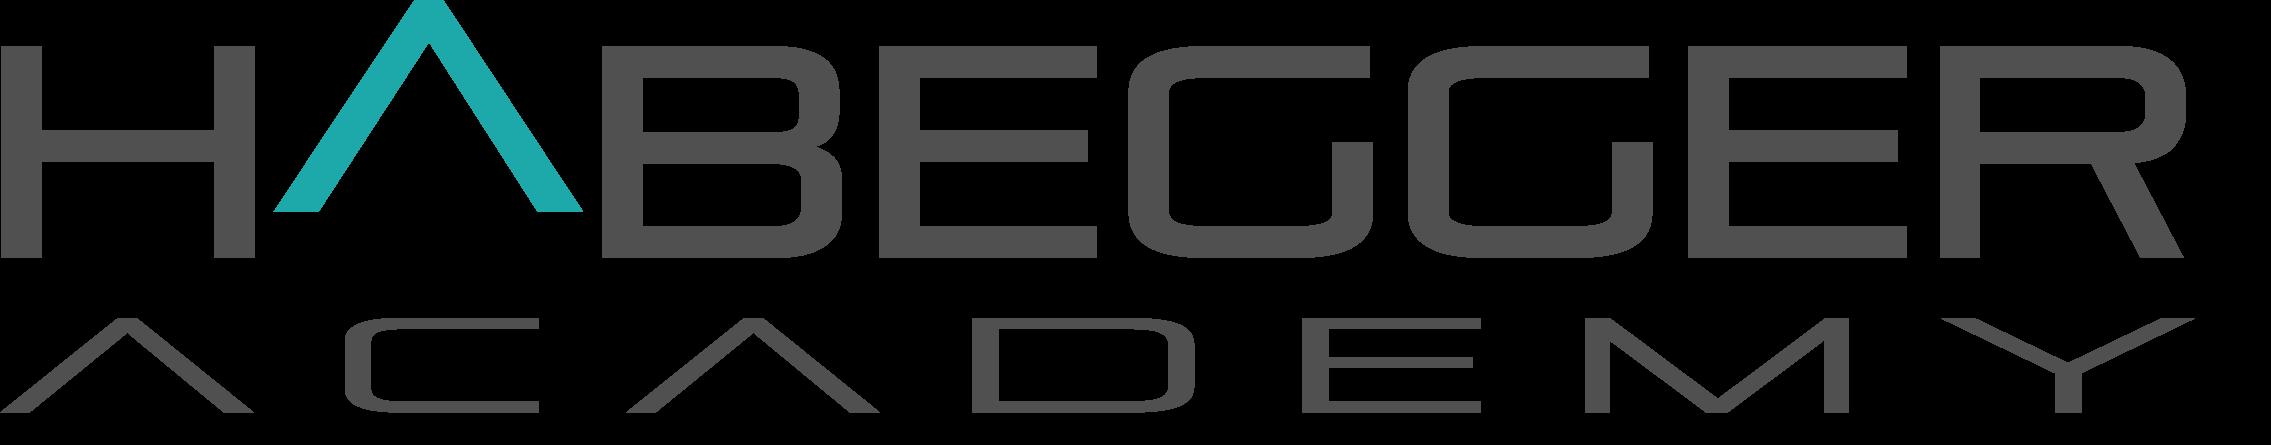 Habegger_Academy